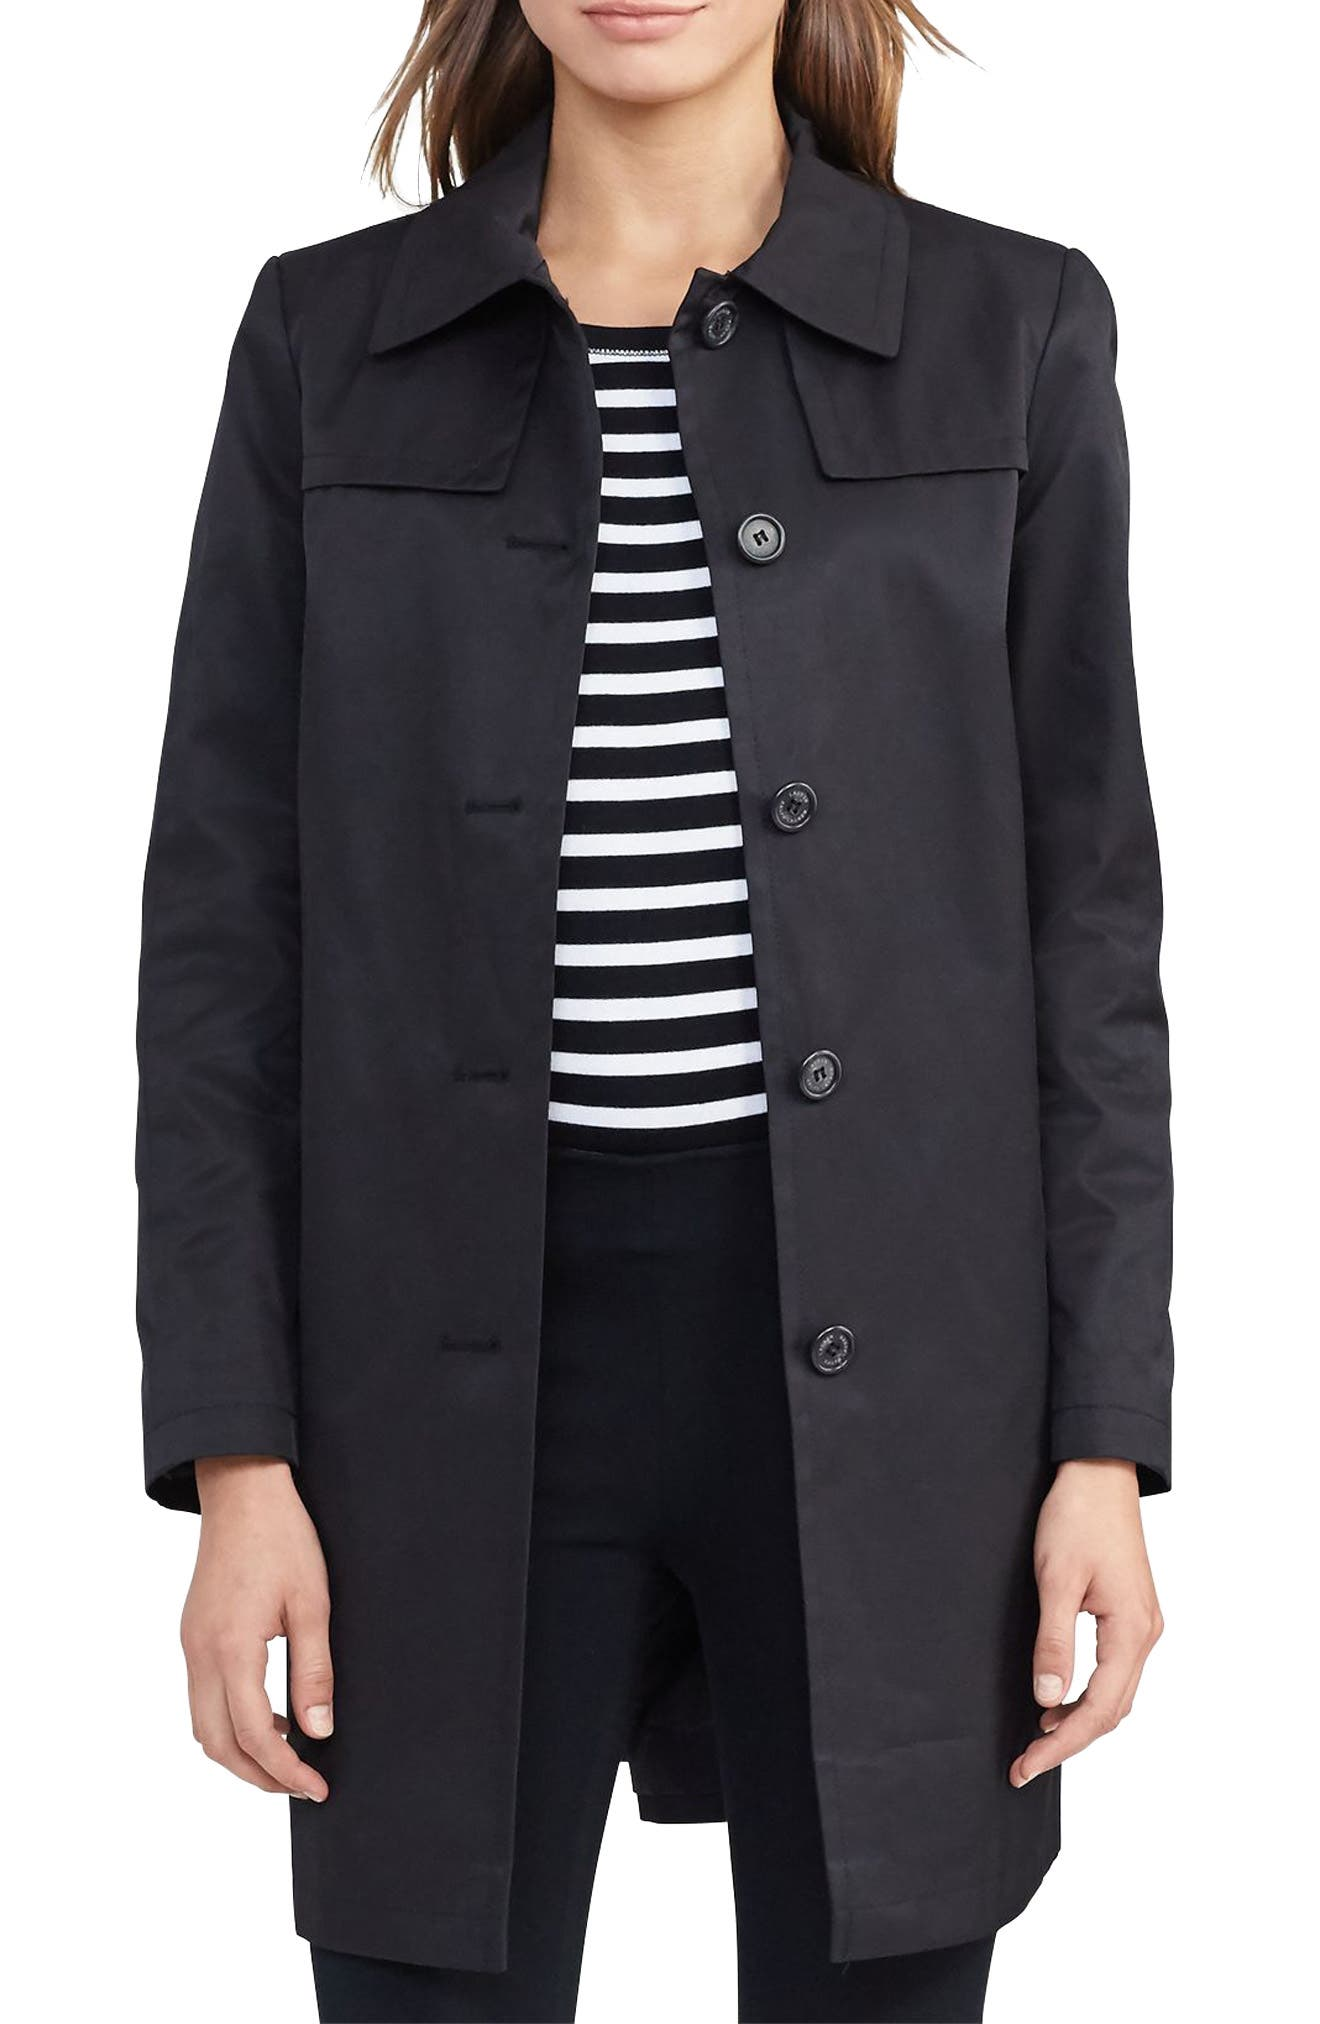 A-Line Trench Coat,                             Main thumbnail 1, color,                             Black